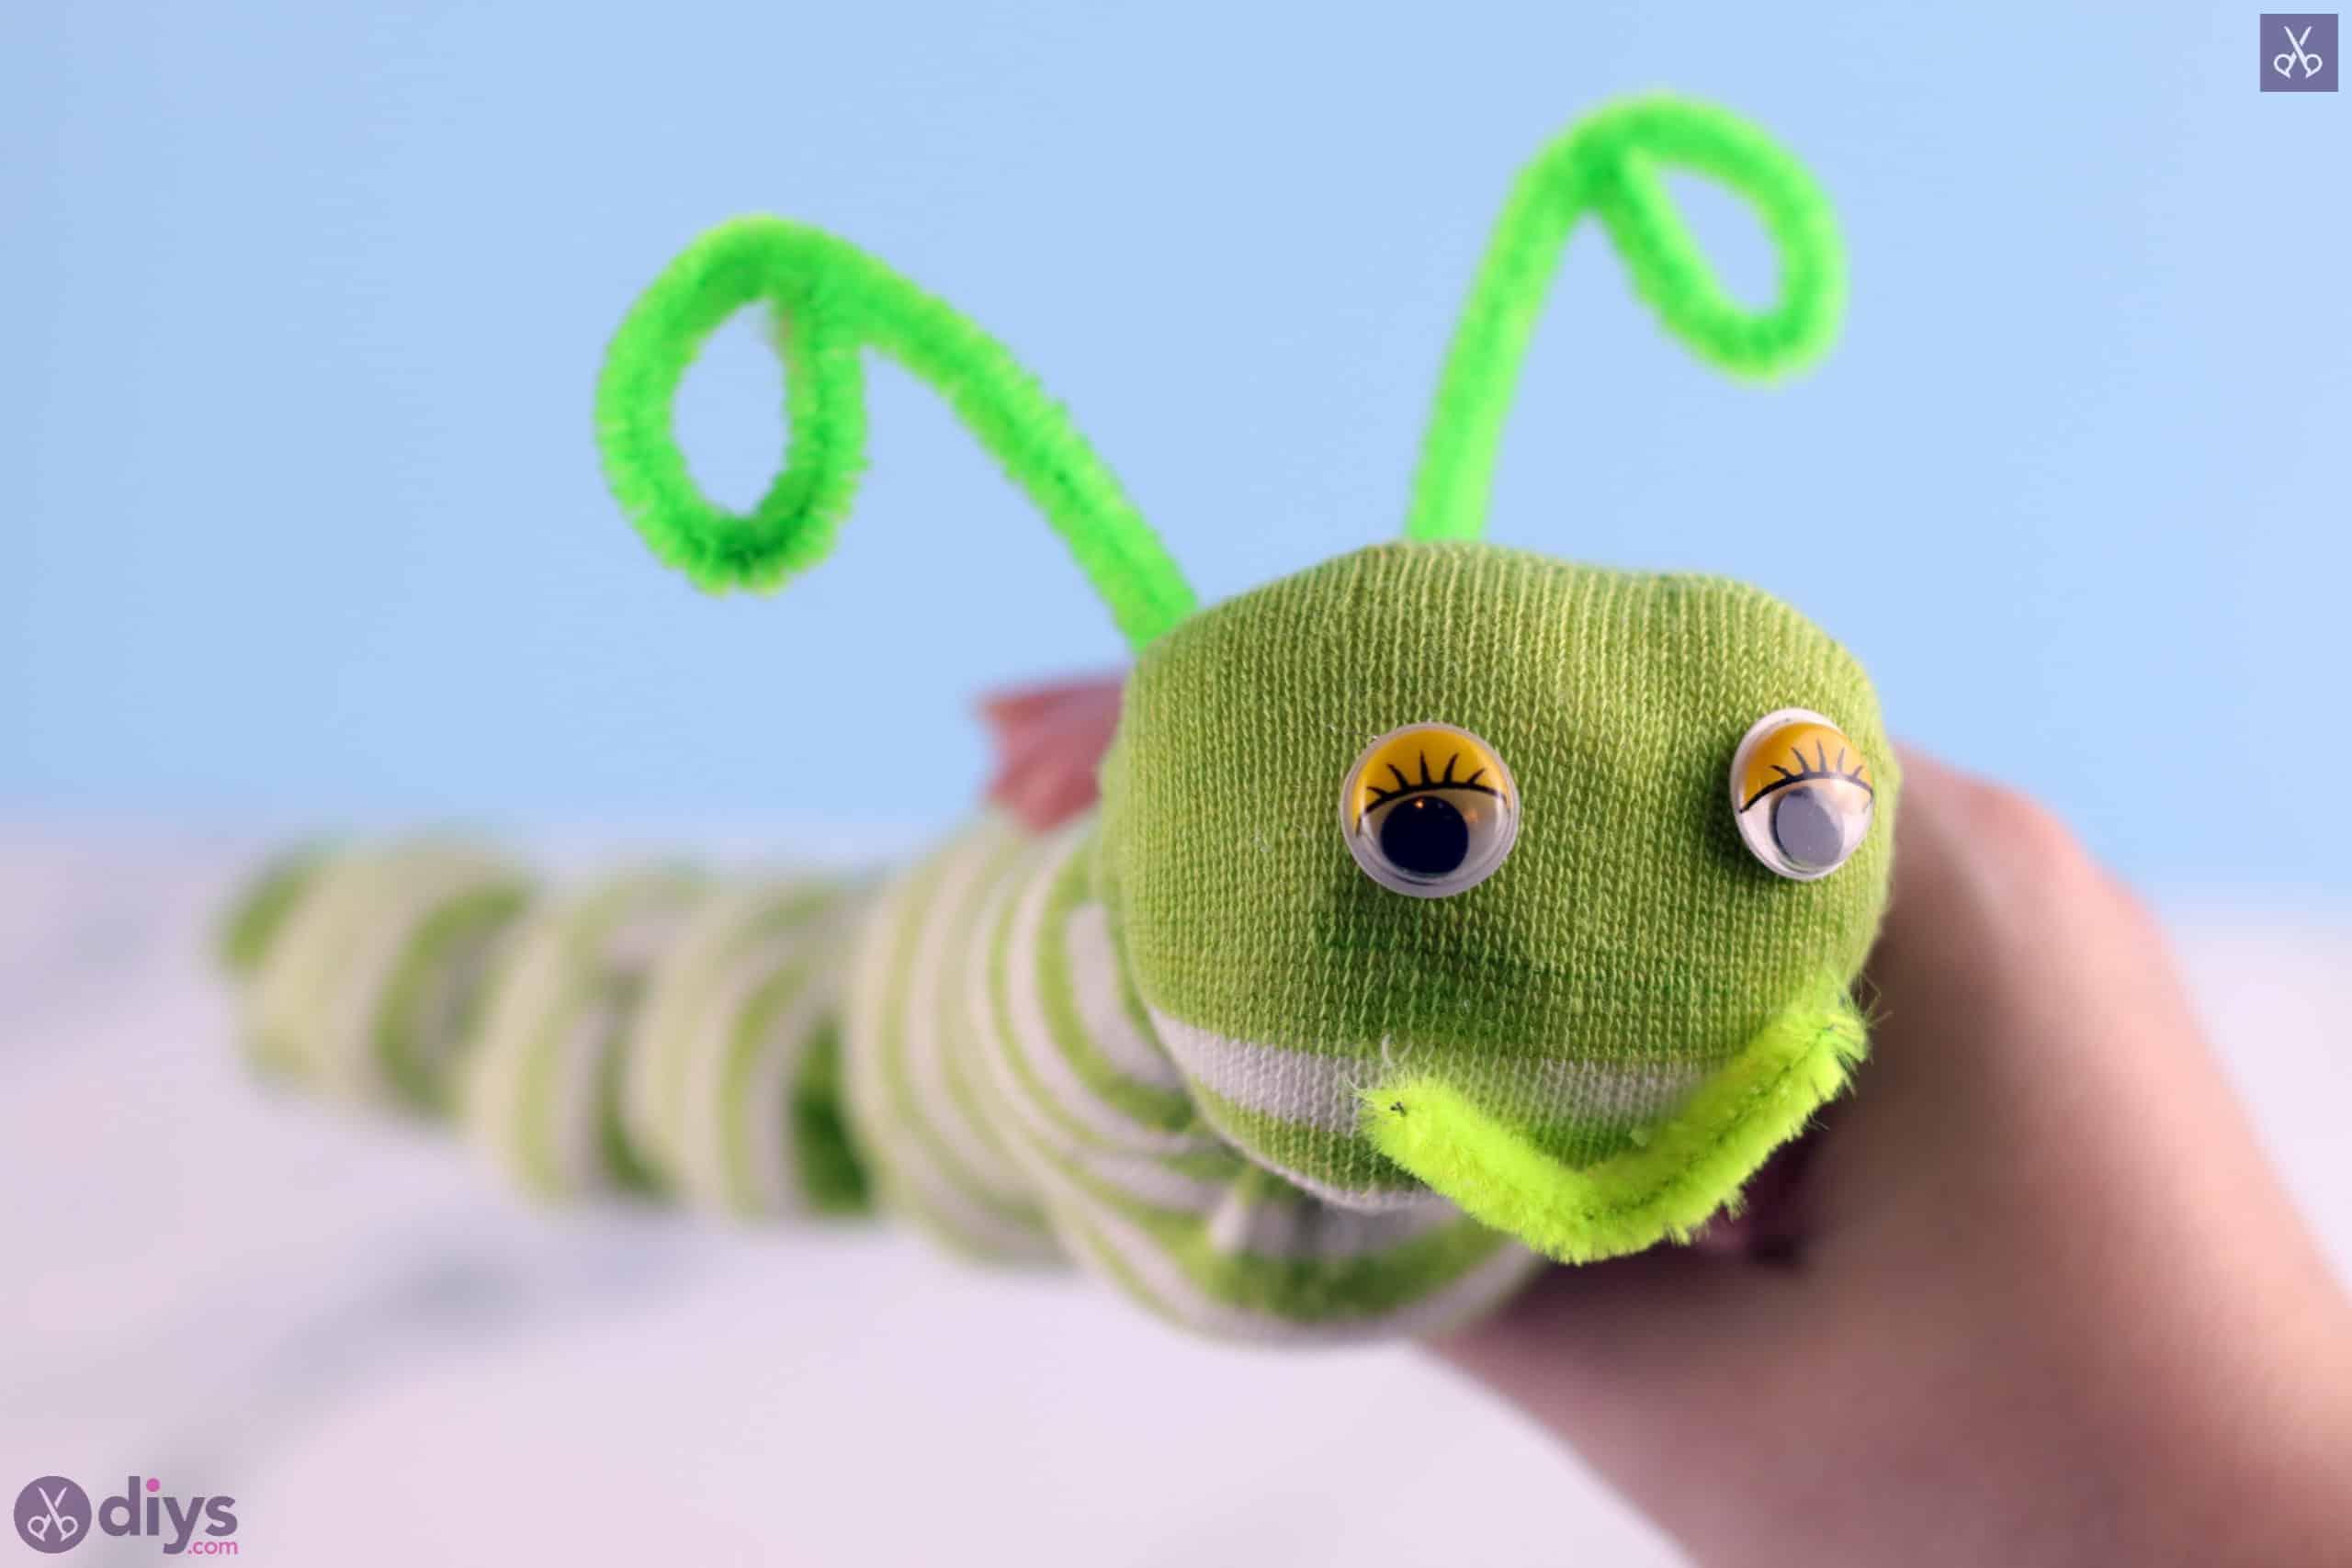 Diy no sew sock worm for kids